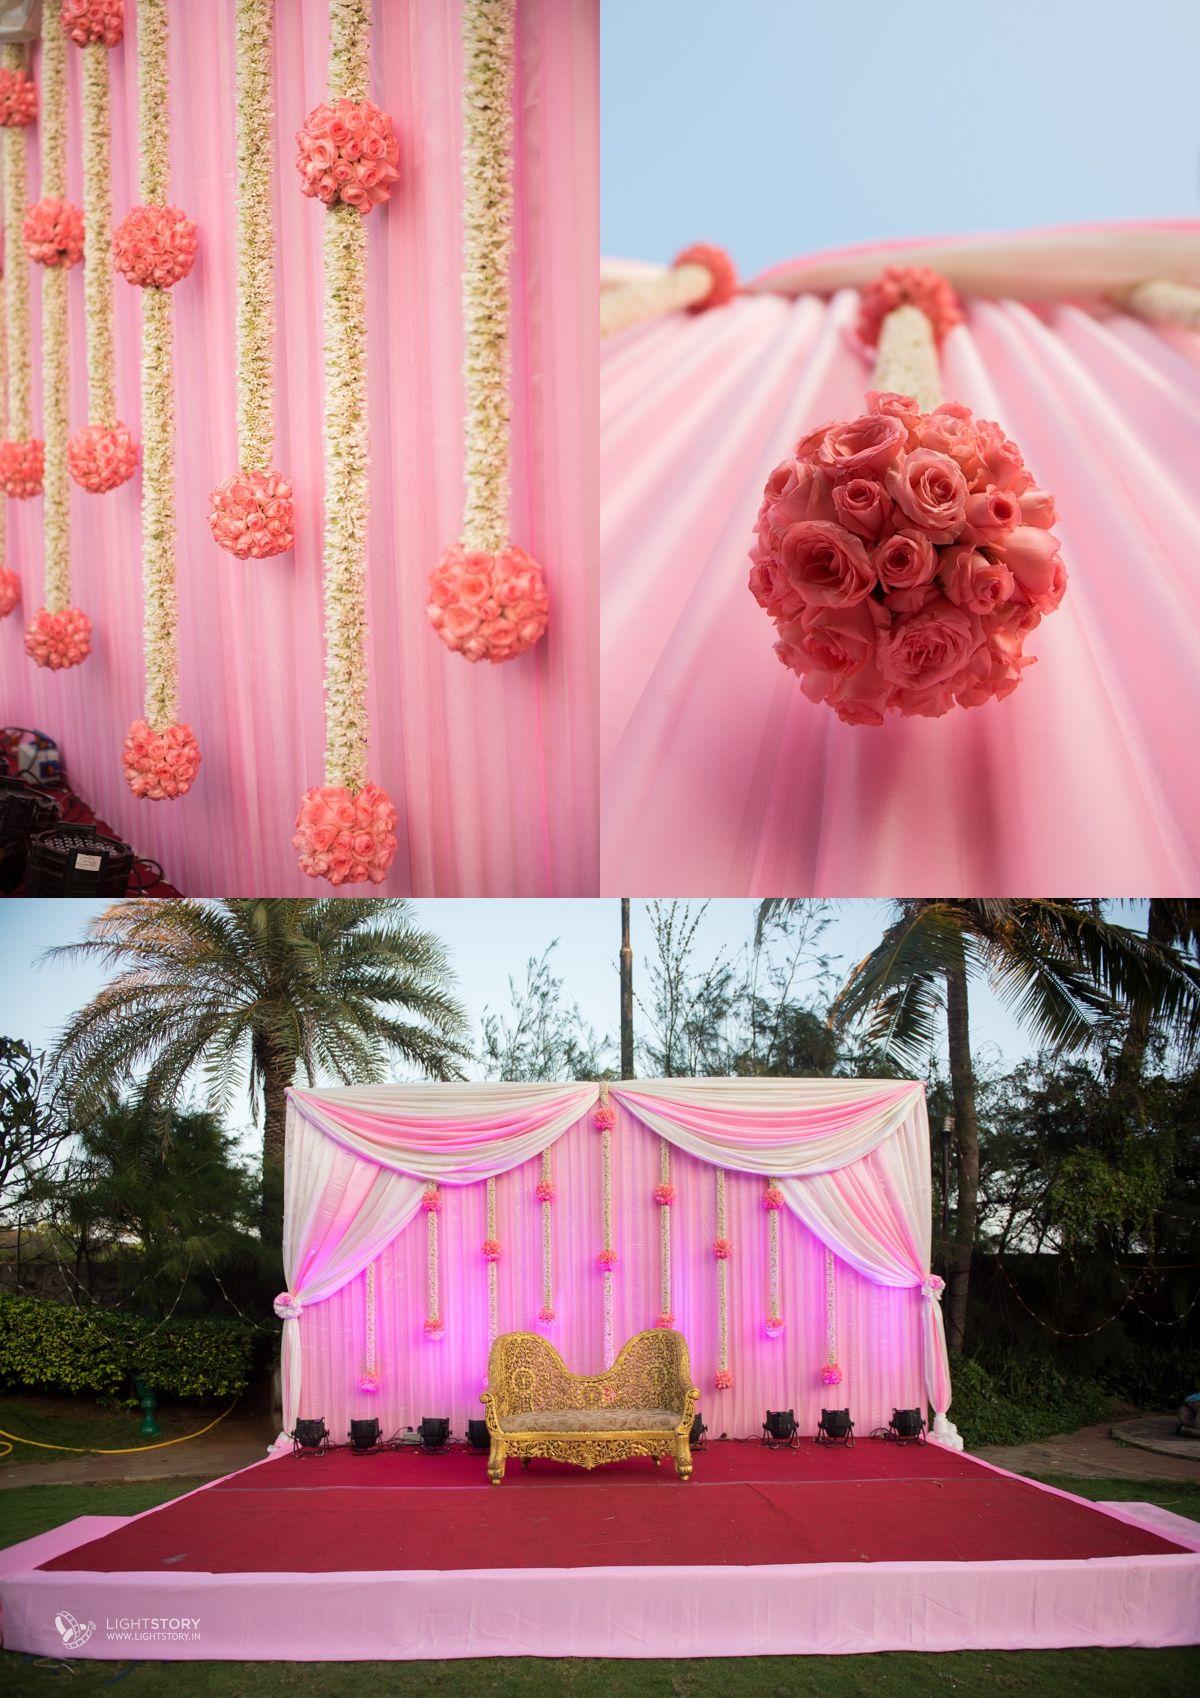 Wedding stage decoration delhi  Sriniketh  Pavithra  Light Story  yadh  Pinterest  Lights